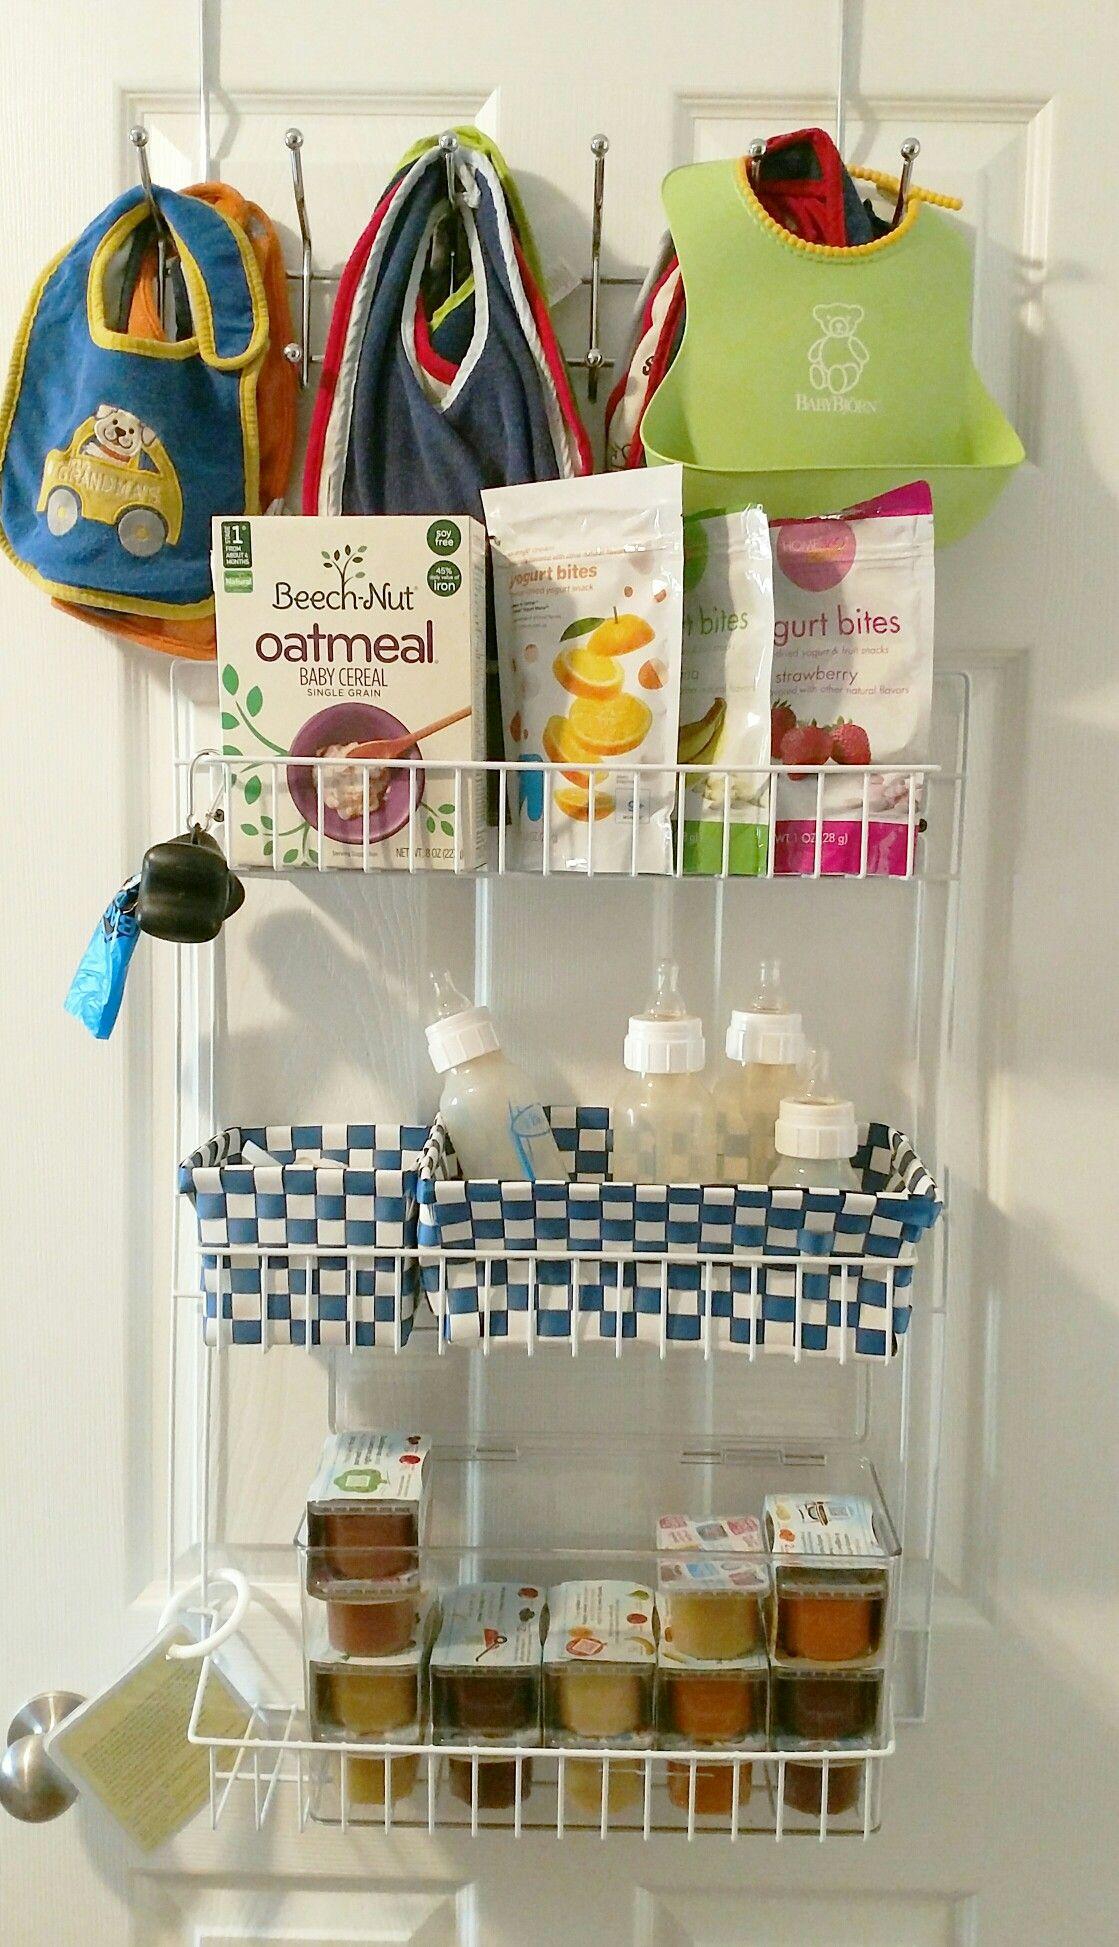 Diy Baby Organization Pantry Closet Bibs Baby Food